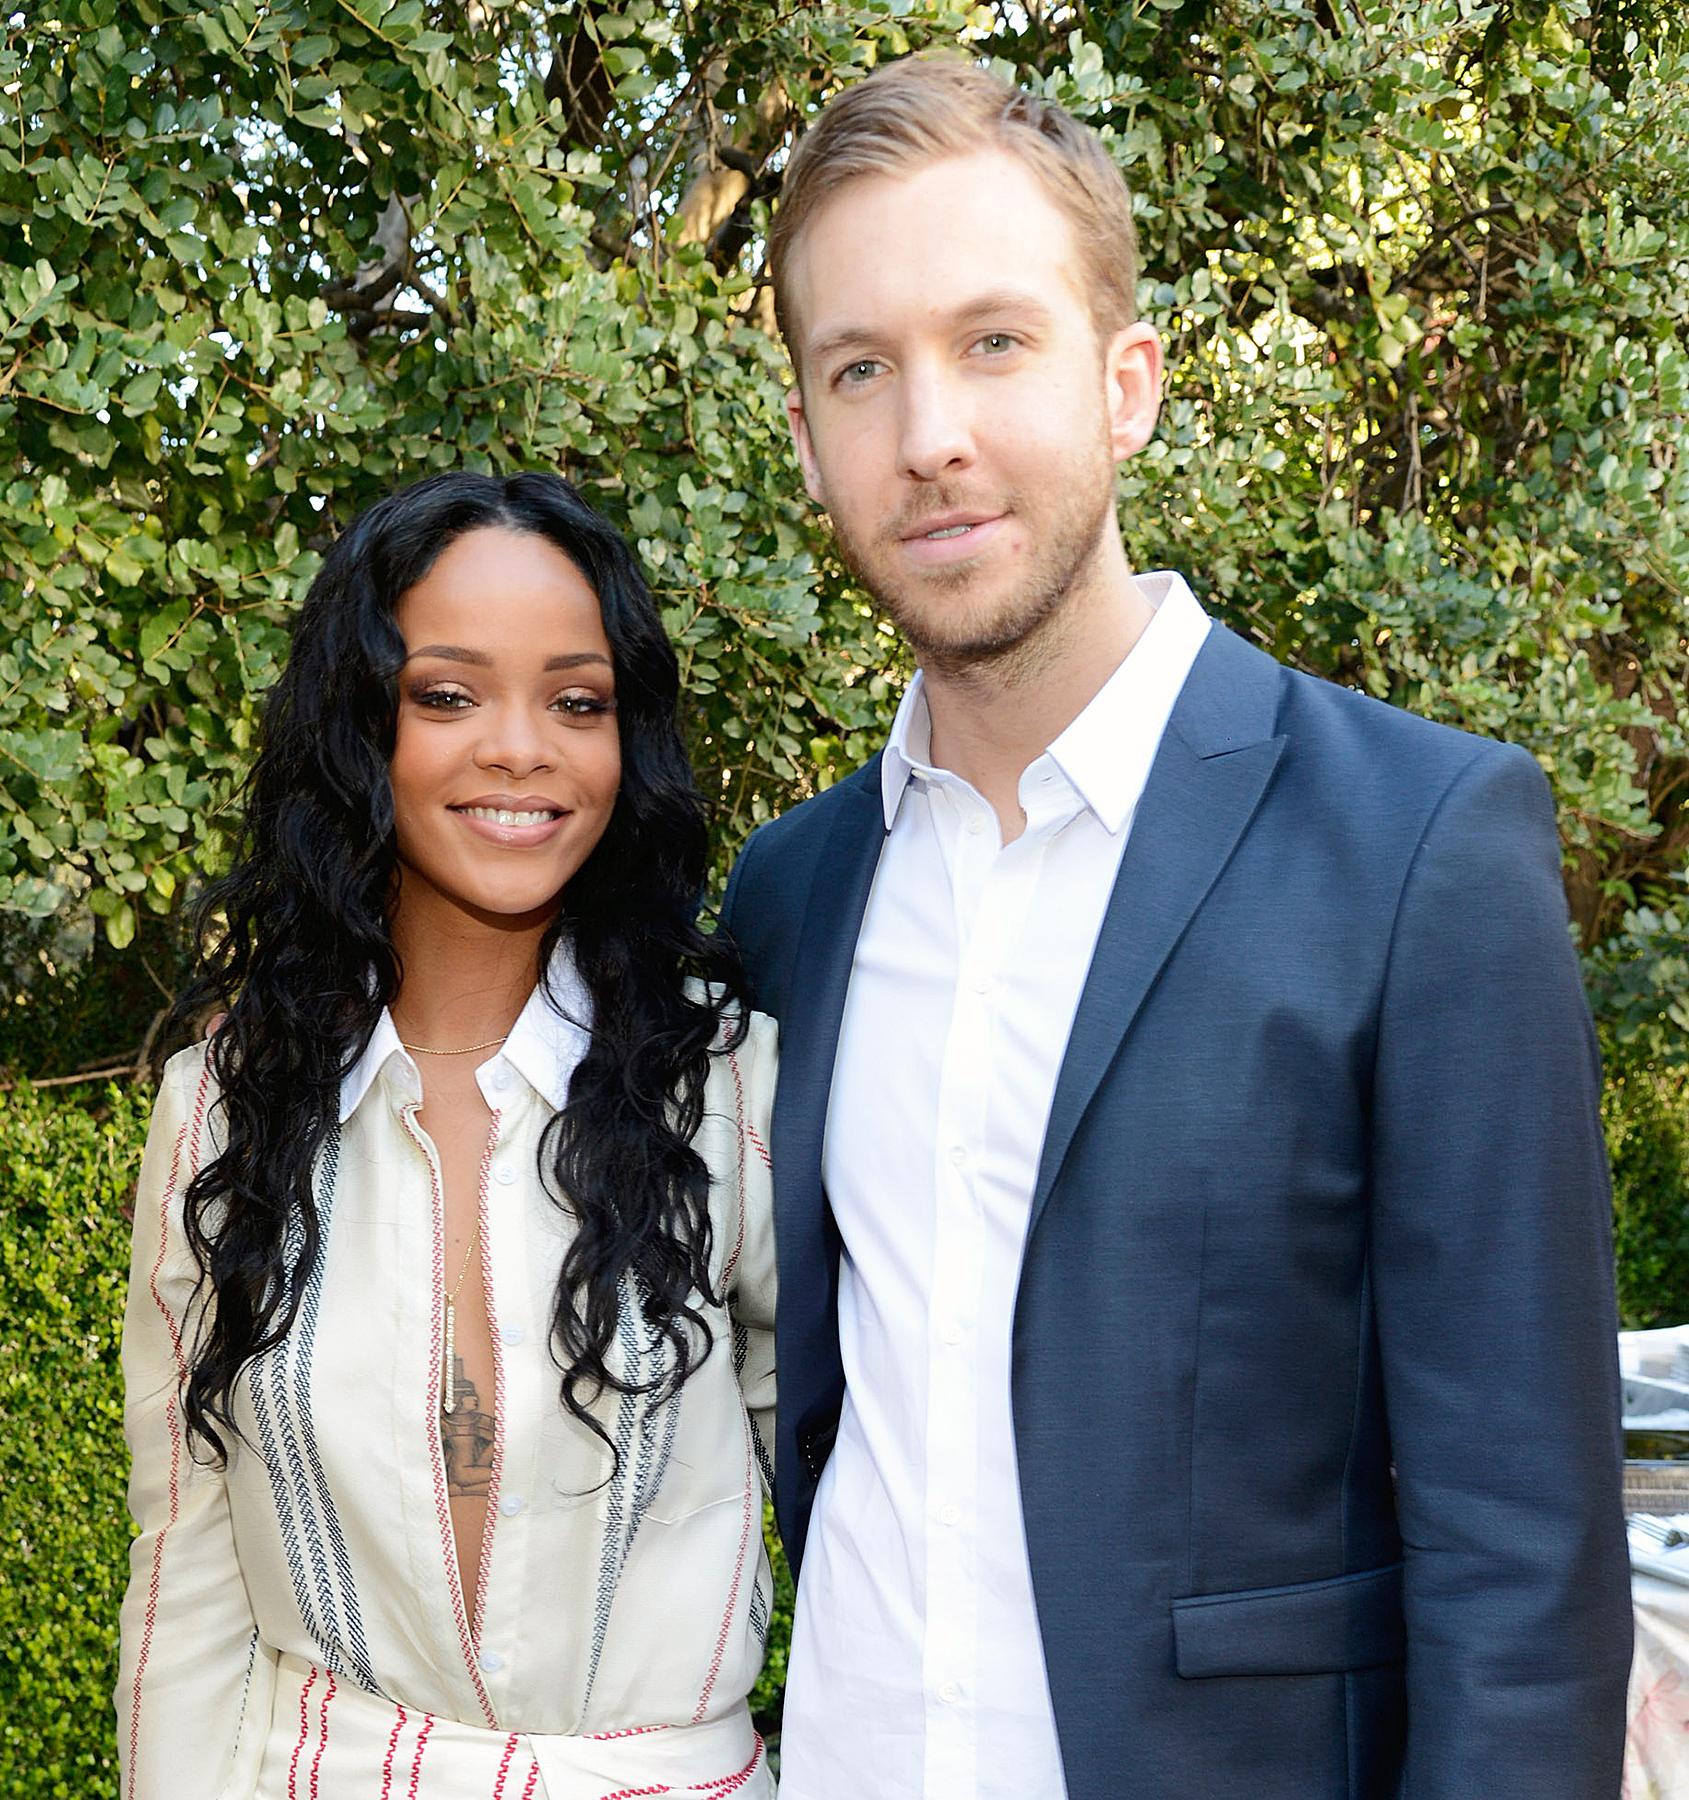 Rihanna and Calvin Harris